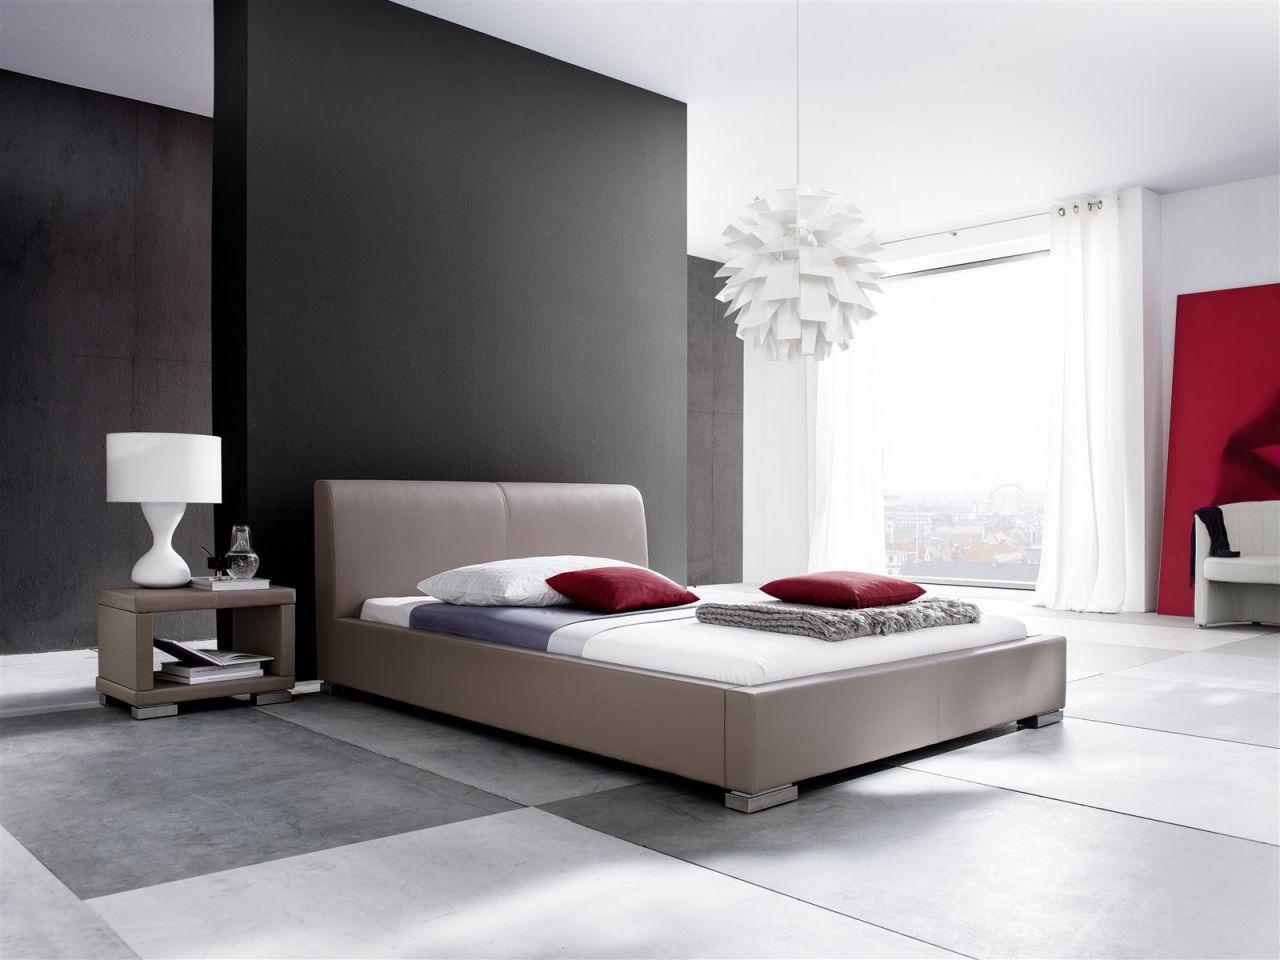 tagesbett 140x200 good ikea hemnes tagesbett inspiration co en ikea brimnes tagesbett with. Black Bedroom Furniture Sets. Home Design Ideas